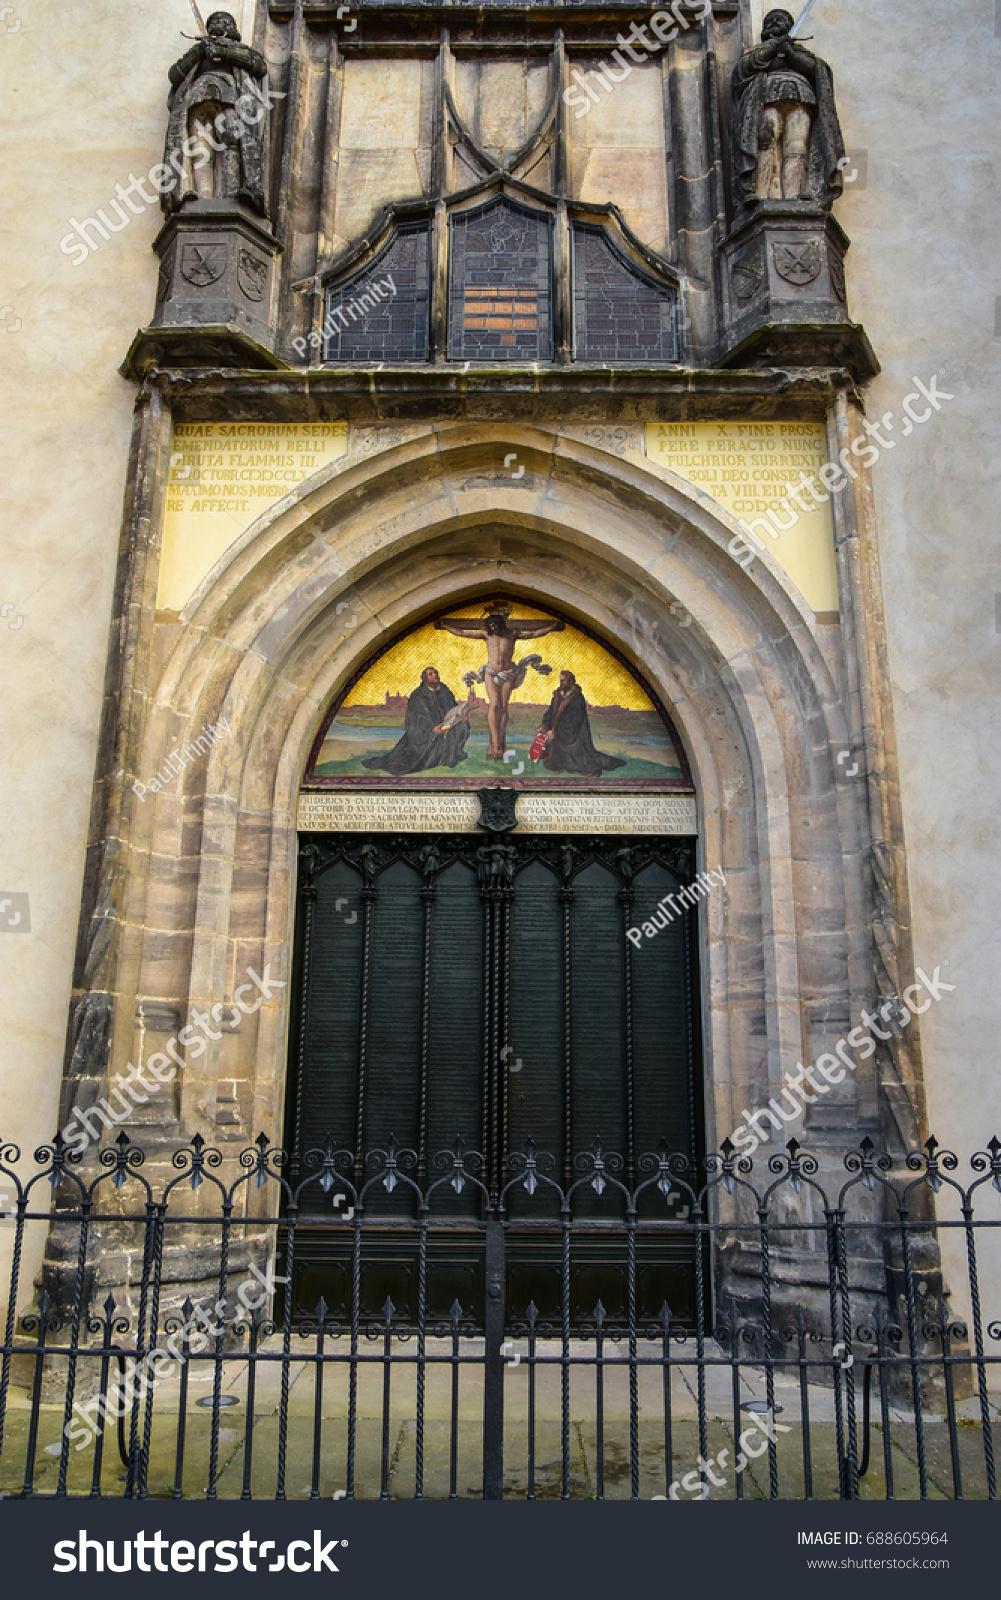 Decorating martin luther church door photos : Famous Door All Saints Church Where Stock Photo 688605964 ...